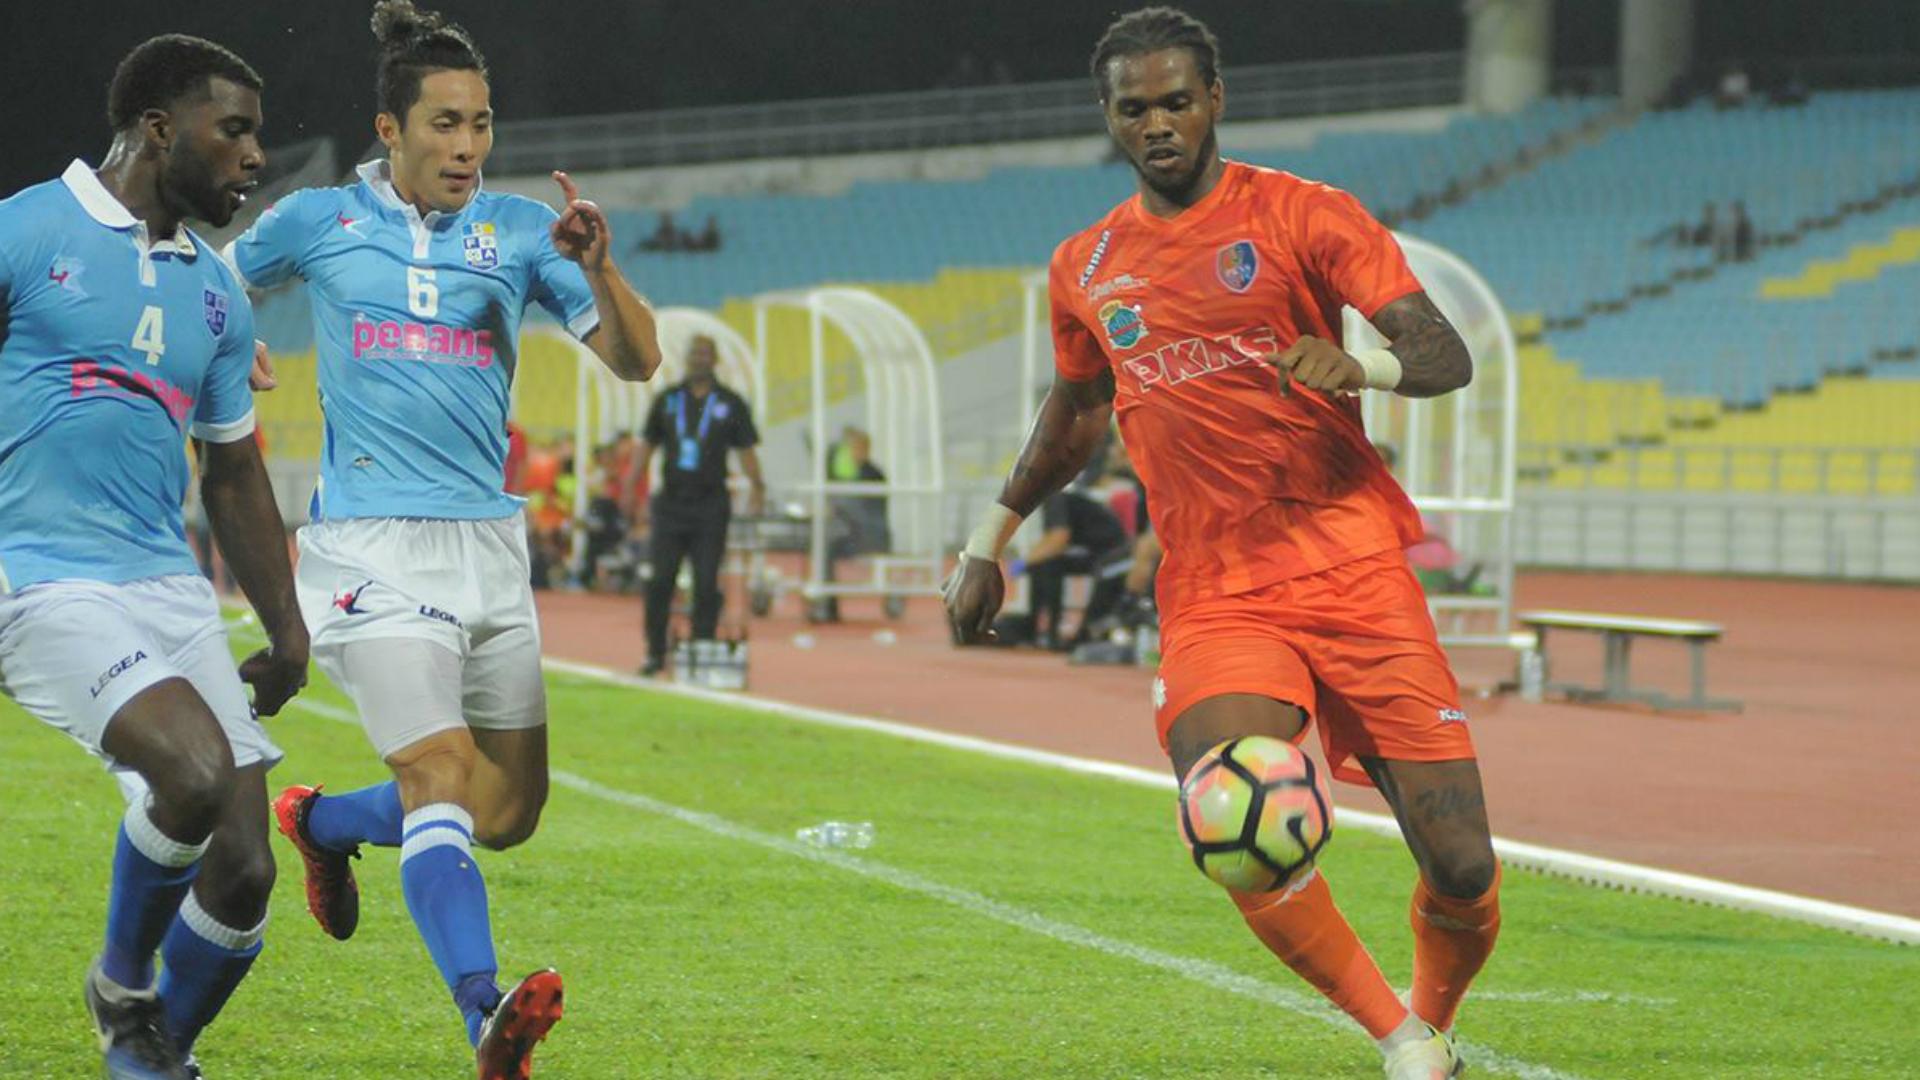 Patrick Ronaldinho Wleh, PKNS, Penang, Super League, 11/07/2017